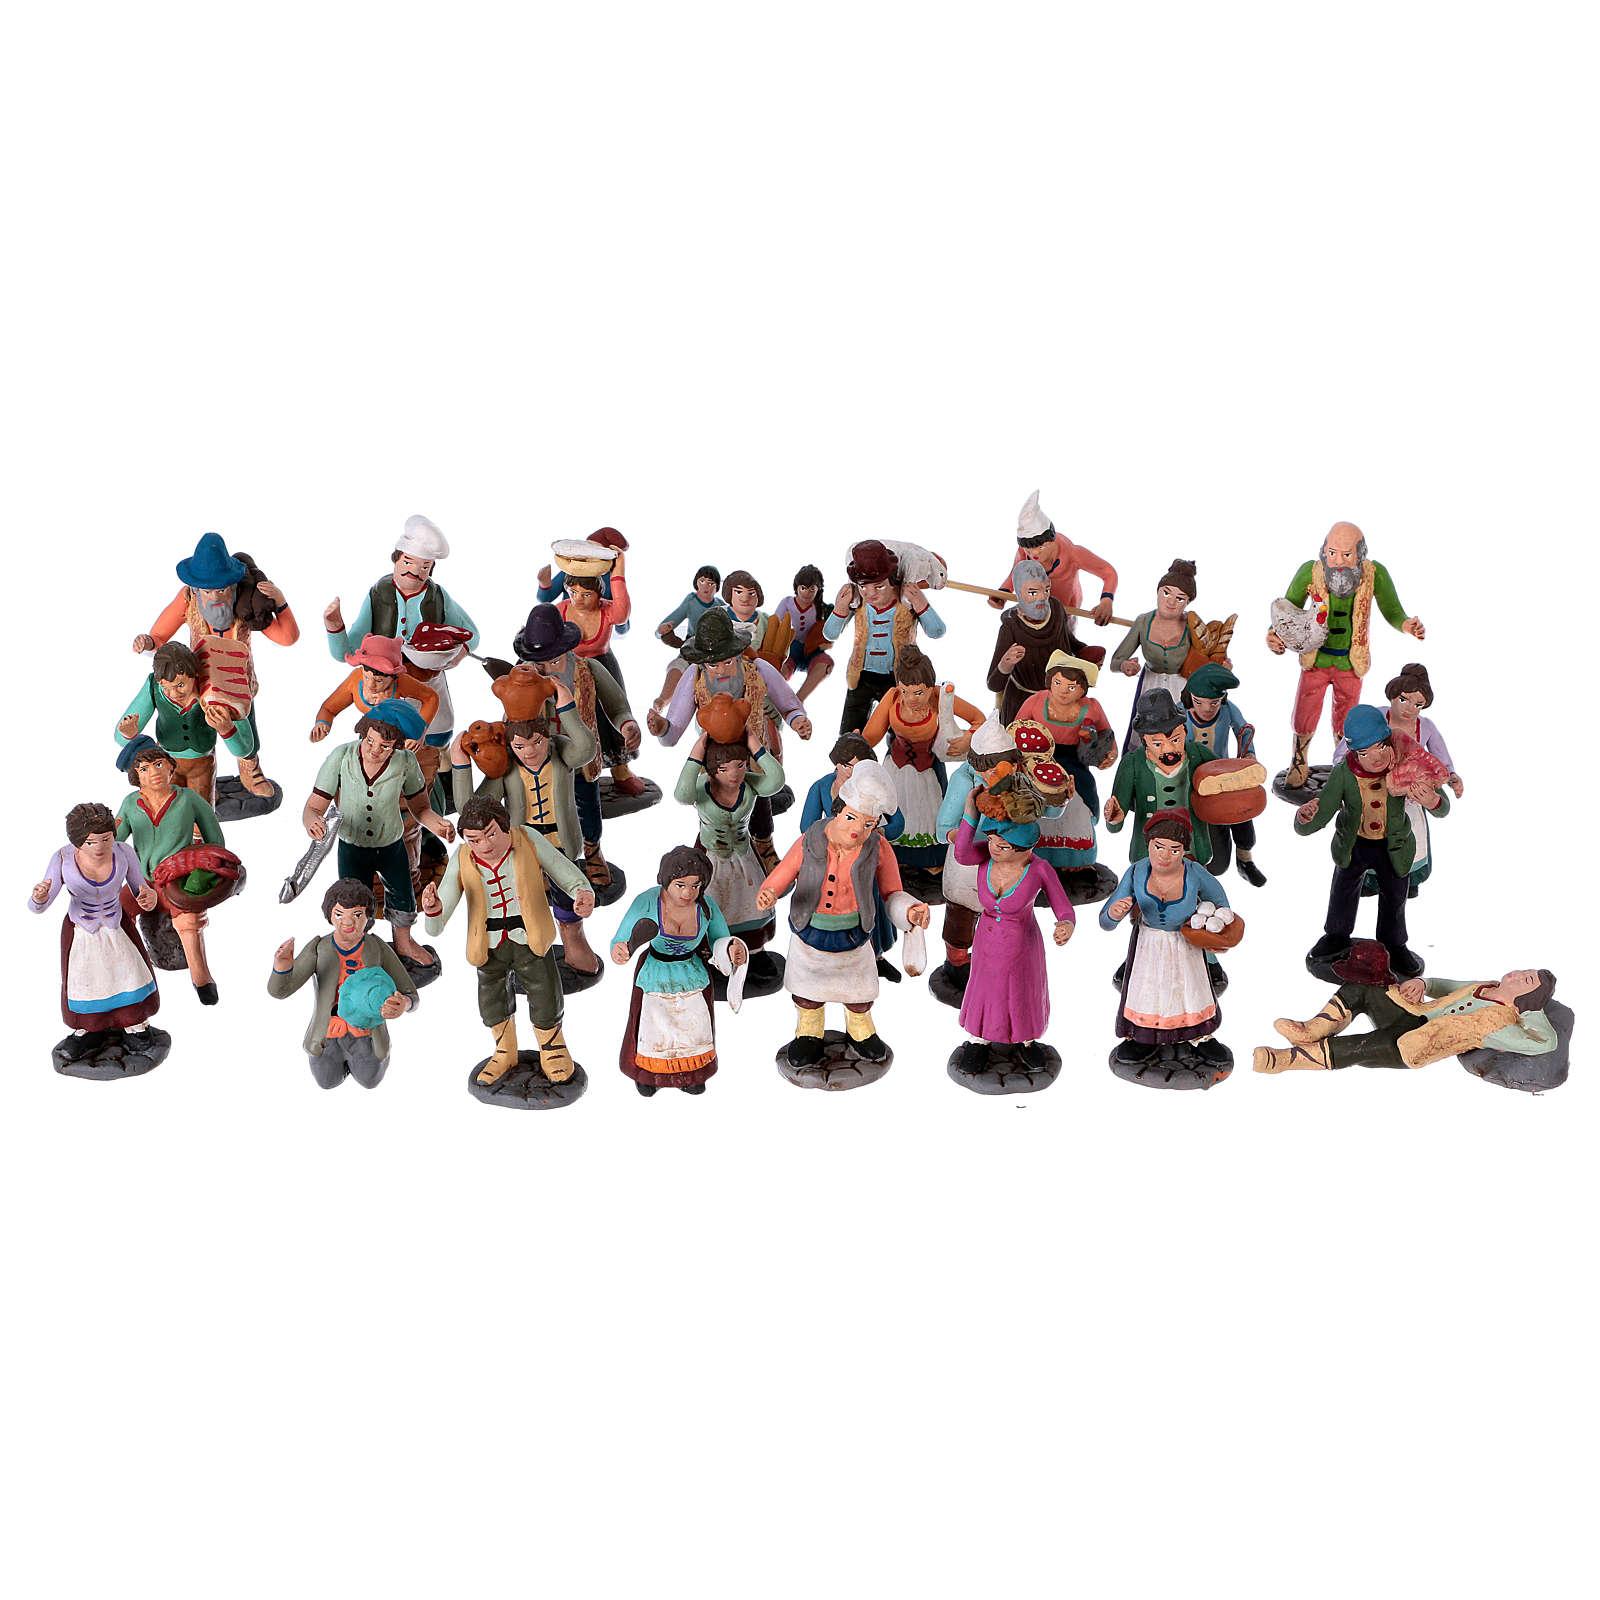 Personaggi presepe terracotta 10 cm presepe napoletano set 36 pz 4